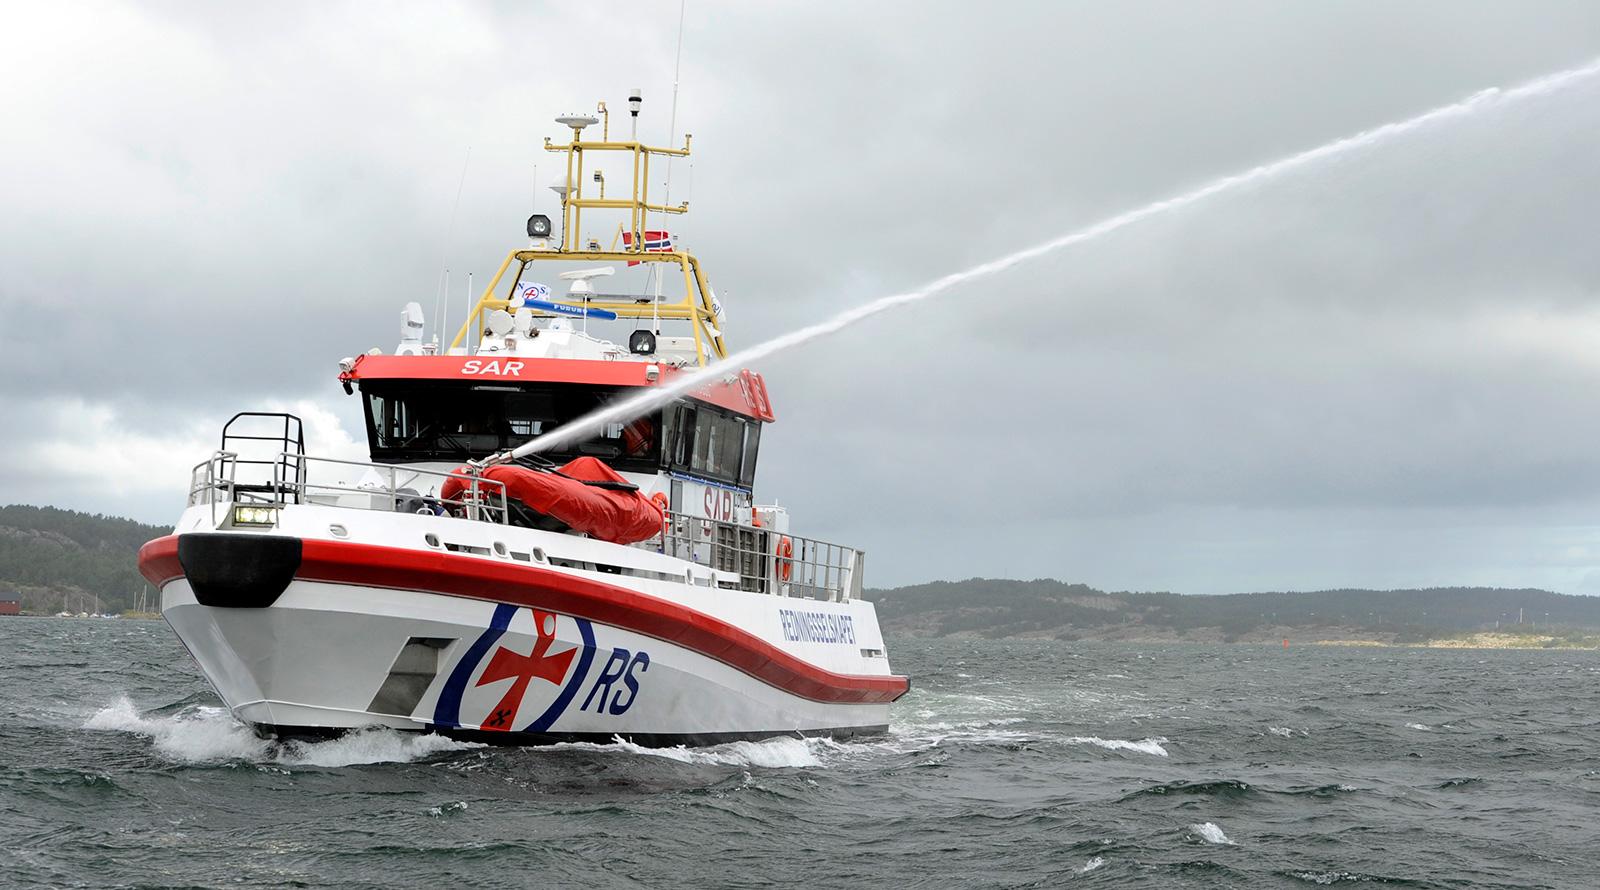 24 M Offshore Rescue Vessel Swedeship